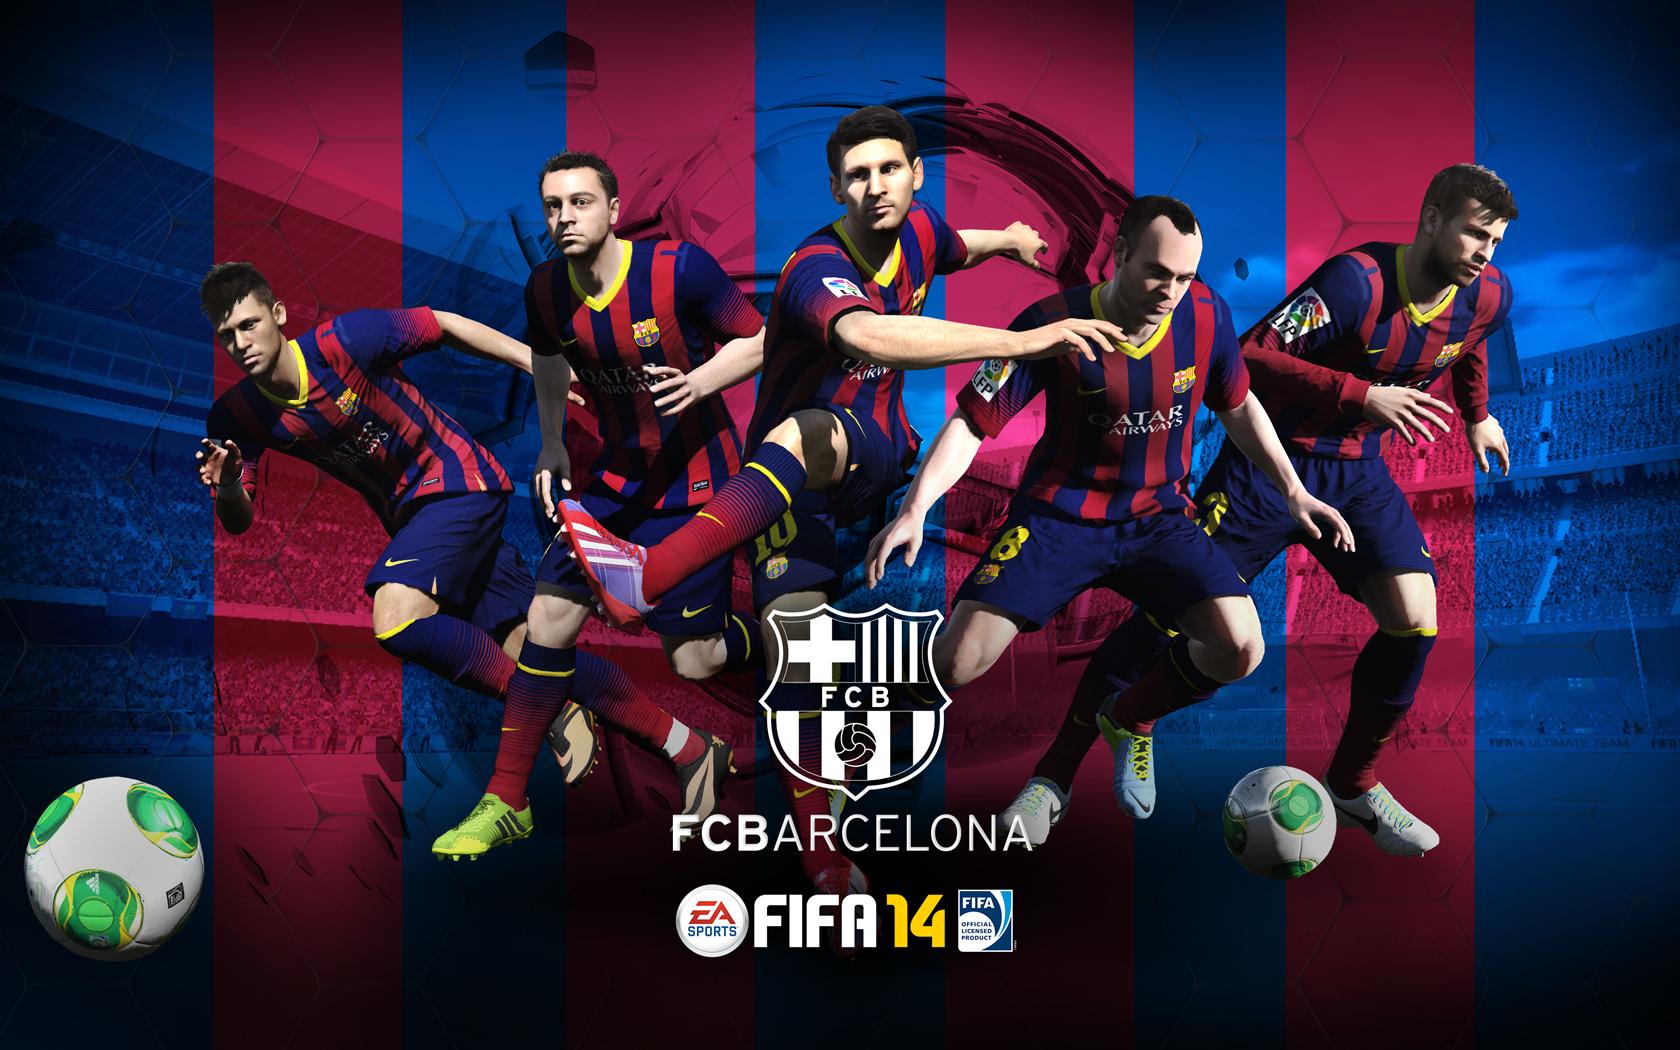 Fc Barcelona Fifa 14 Wallpaper